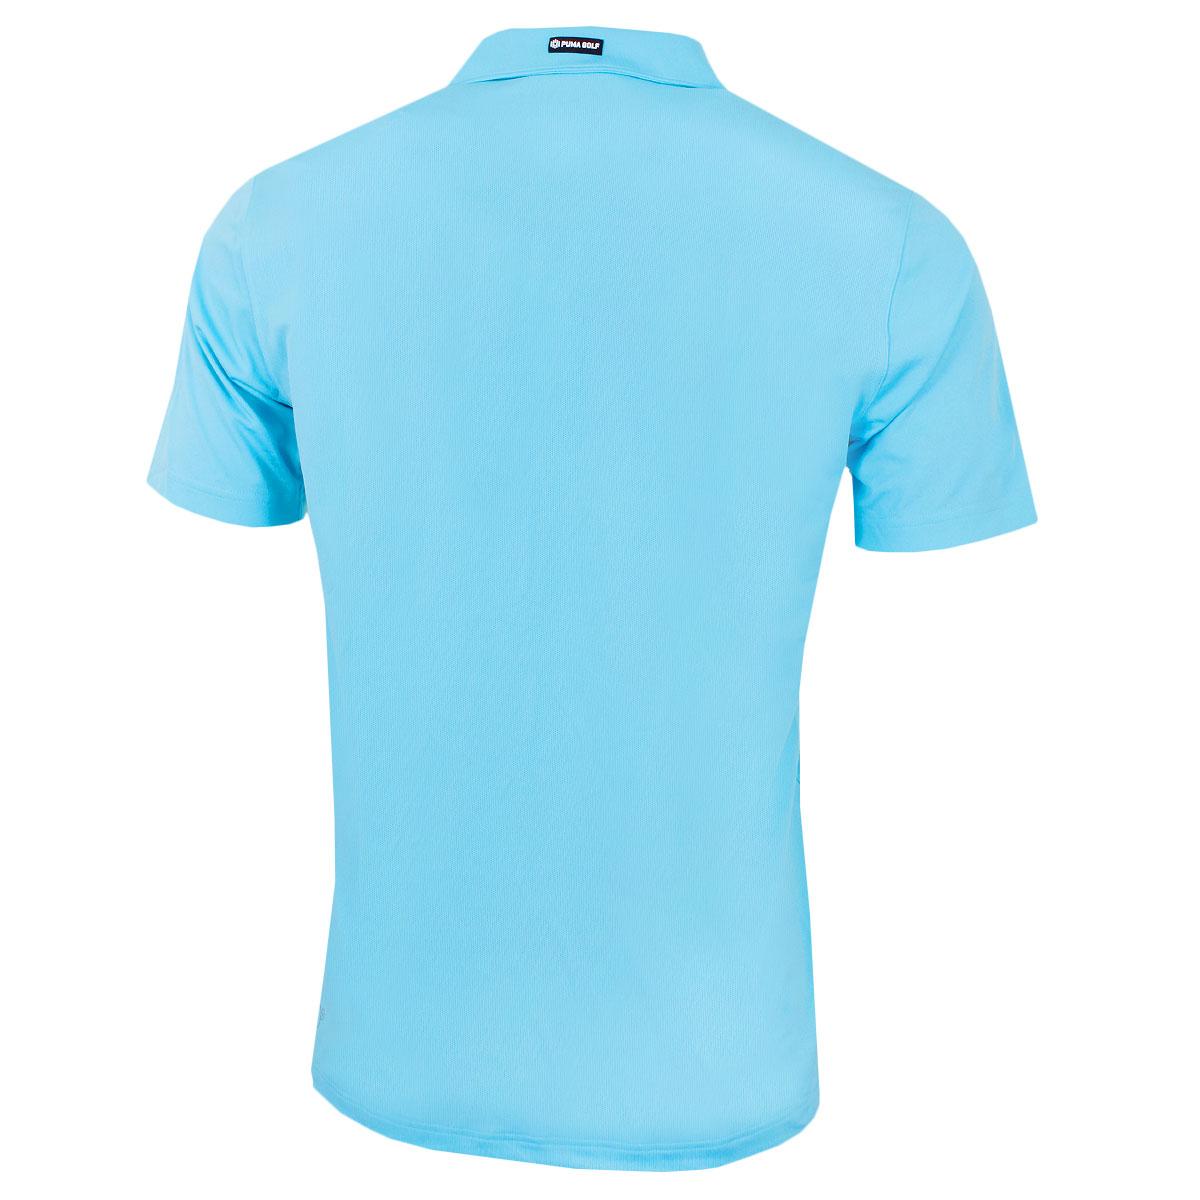 Puma-Golf-Mens-Essential-Pounce-Cresting-DryCell-Tech-Polo-Shirt-46-OFF-RRP thumbnail 31